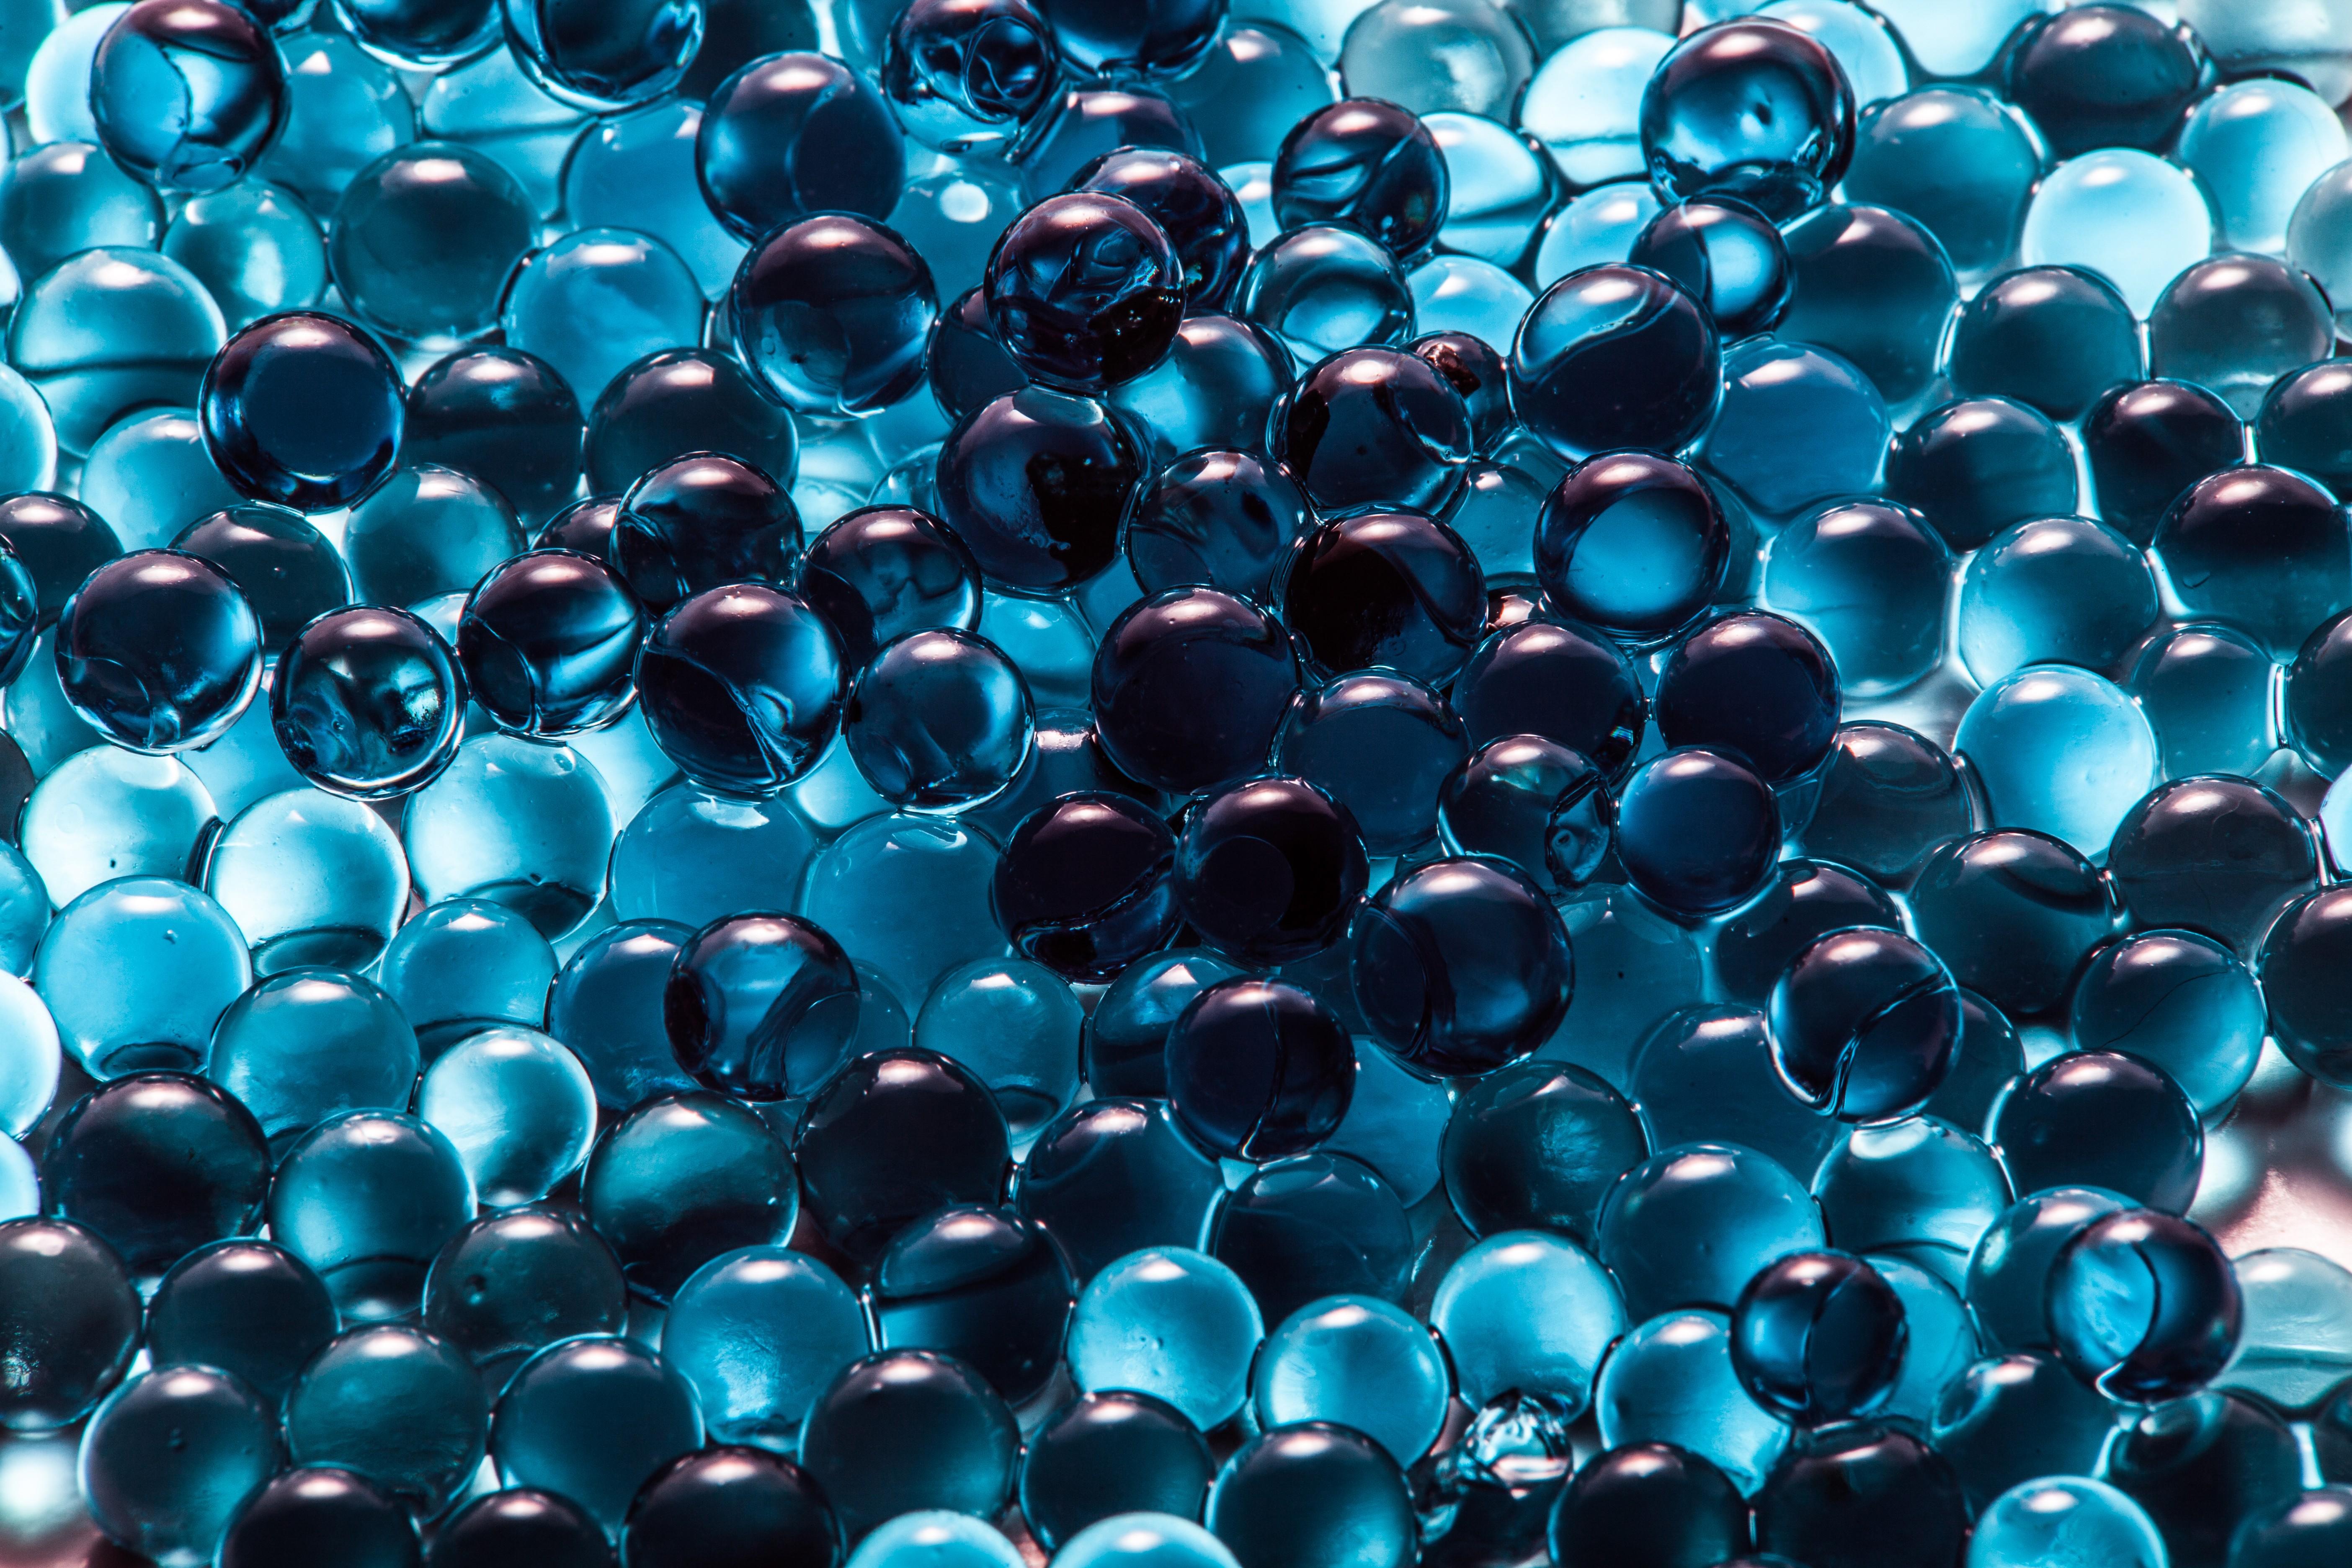 Голубые шары бесплатно